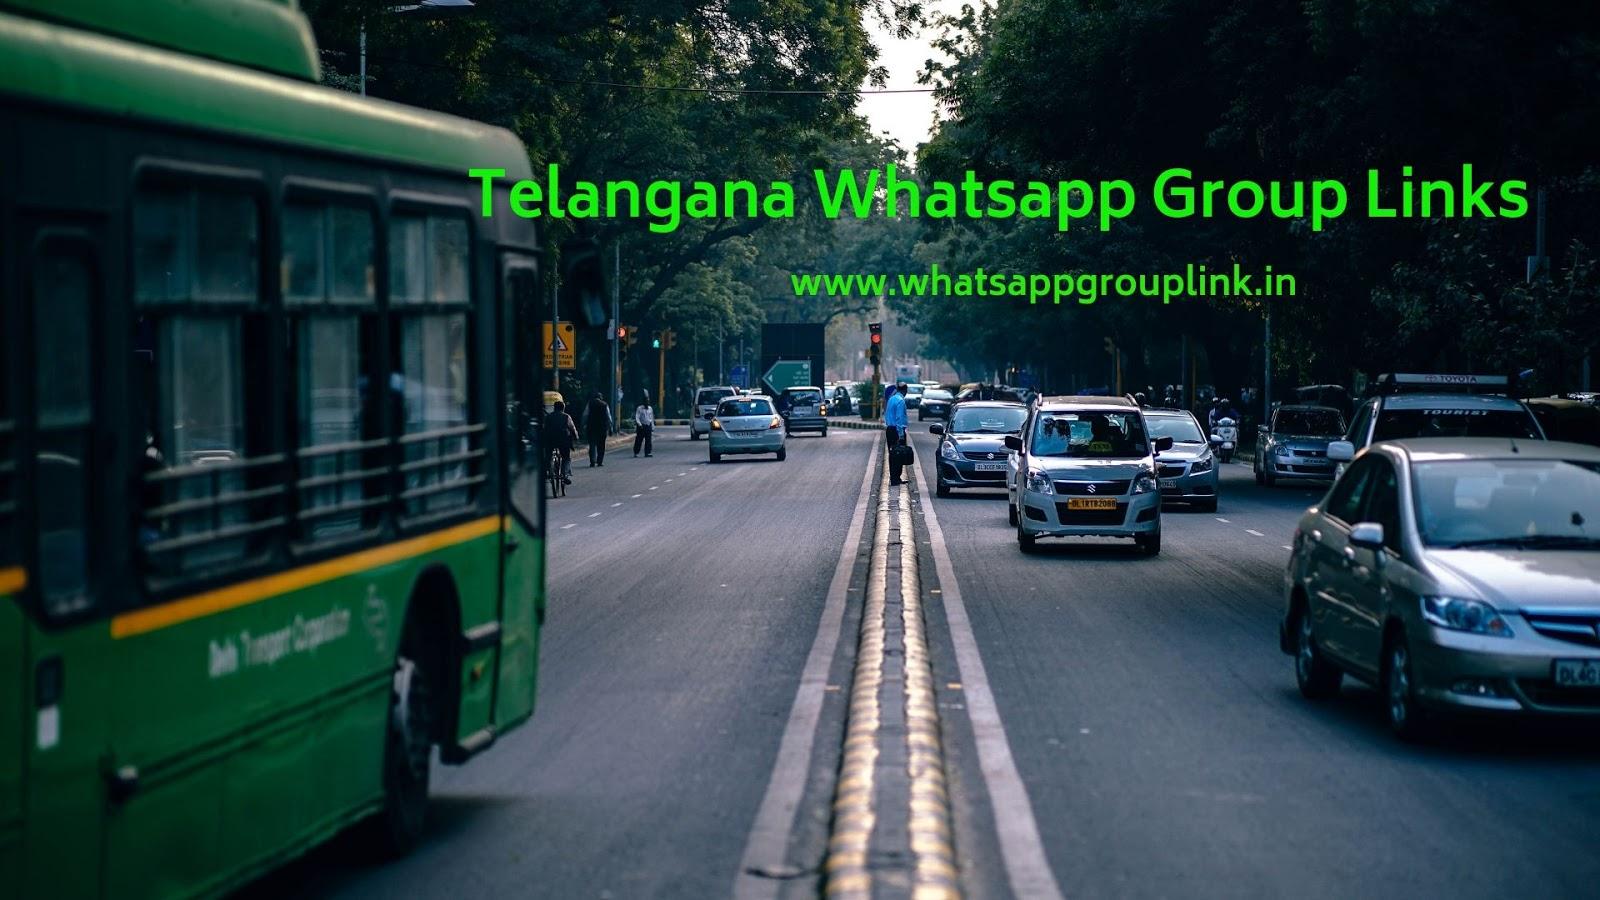 Whatsapp Group Link: Telangana Whatsapp Group Links